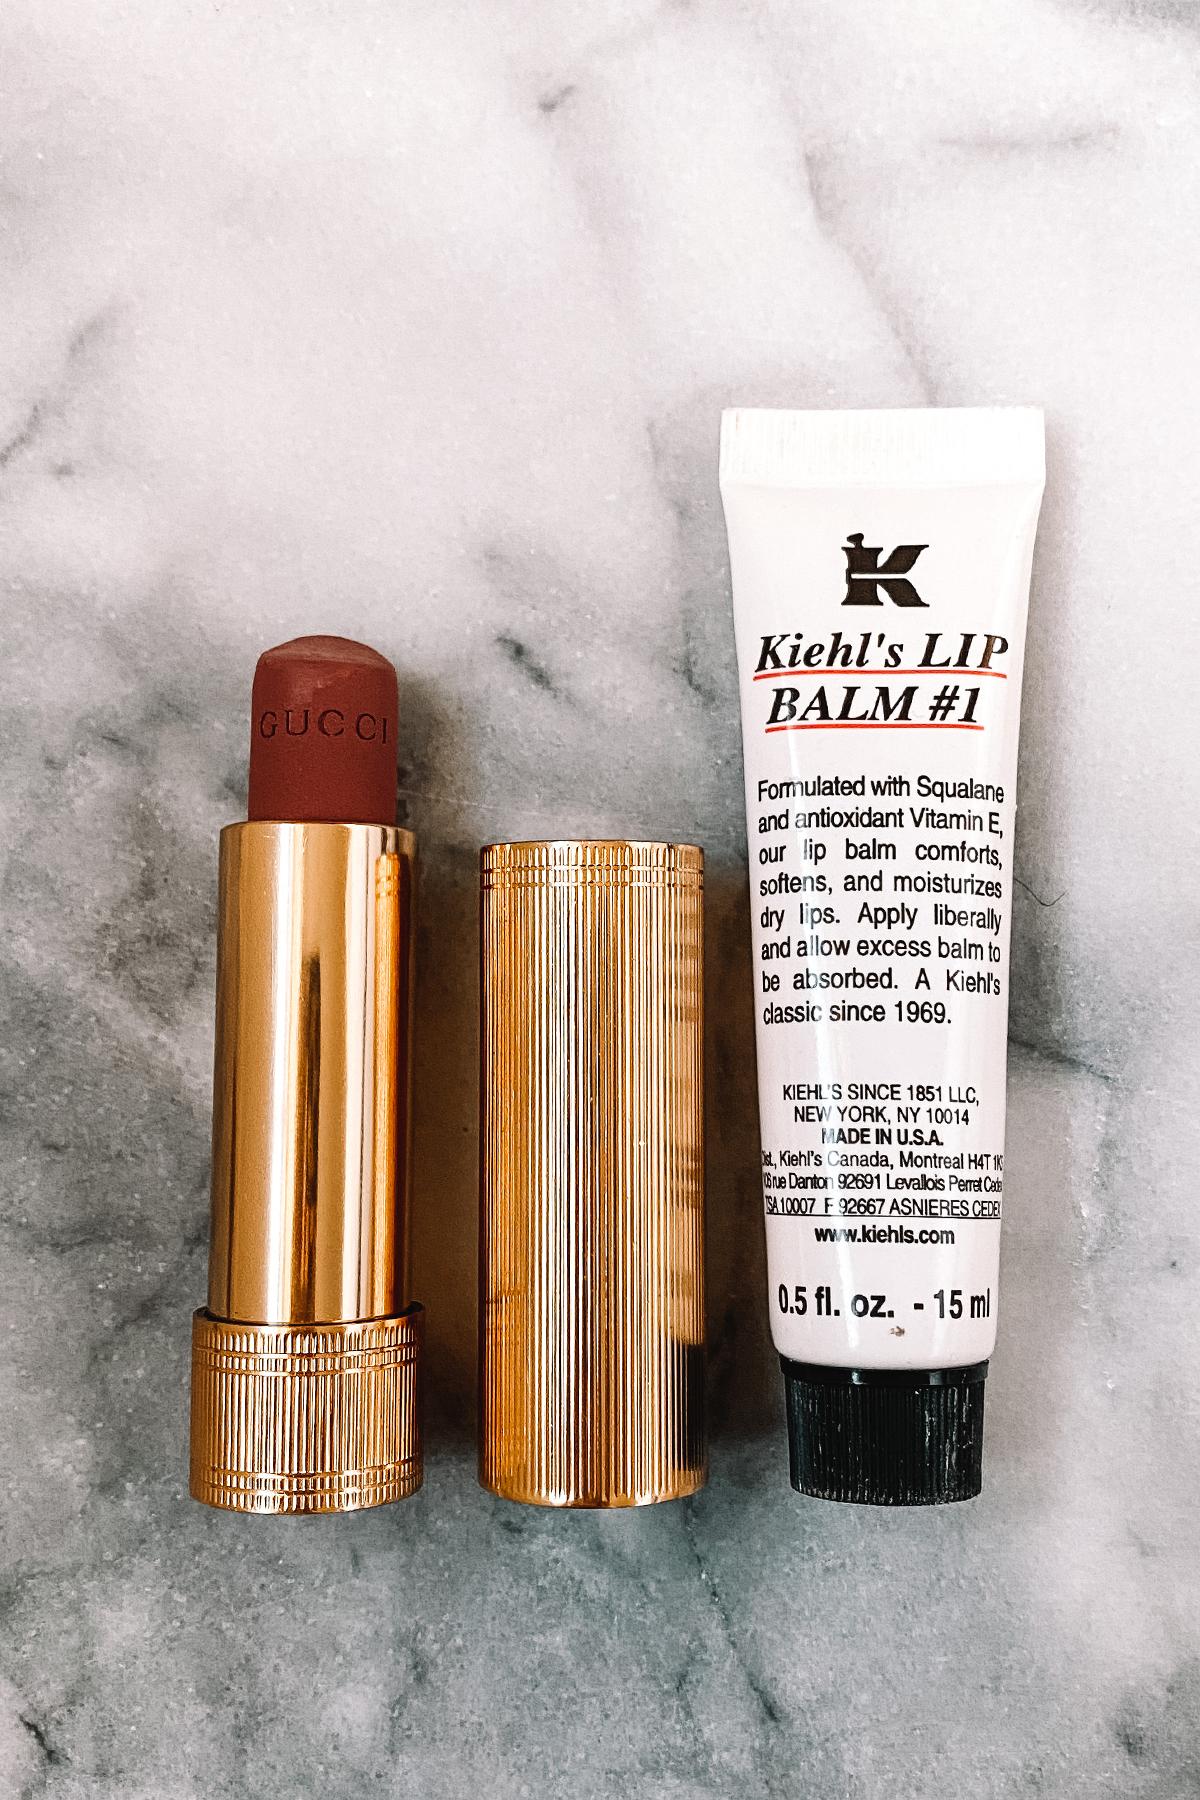 Fashion Jackson Sephora Gucci Lipstick Kiehls Lip Balm